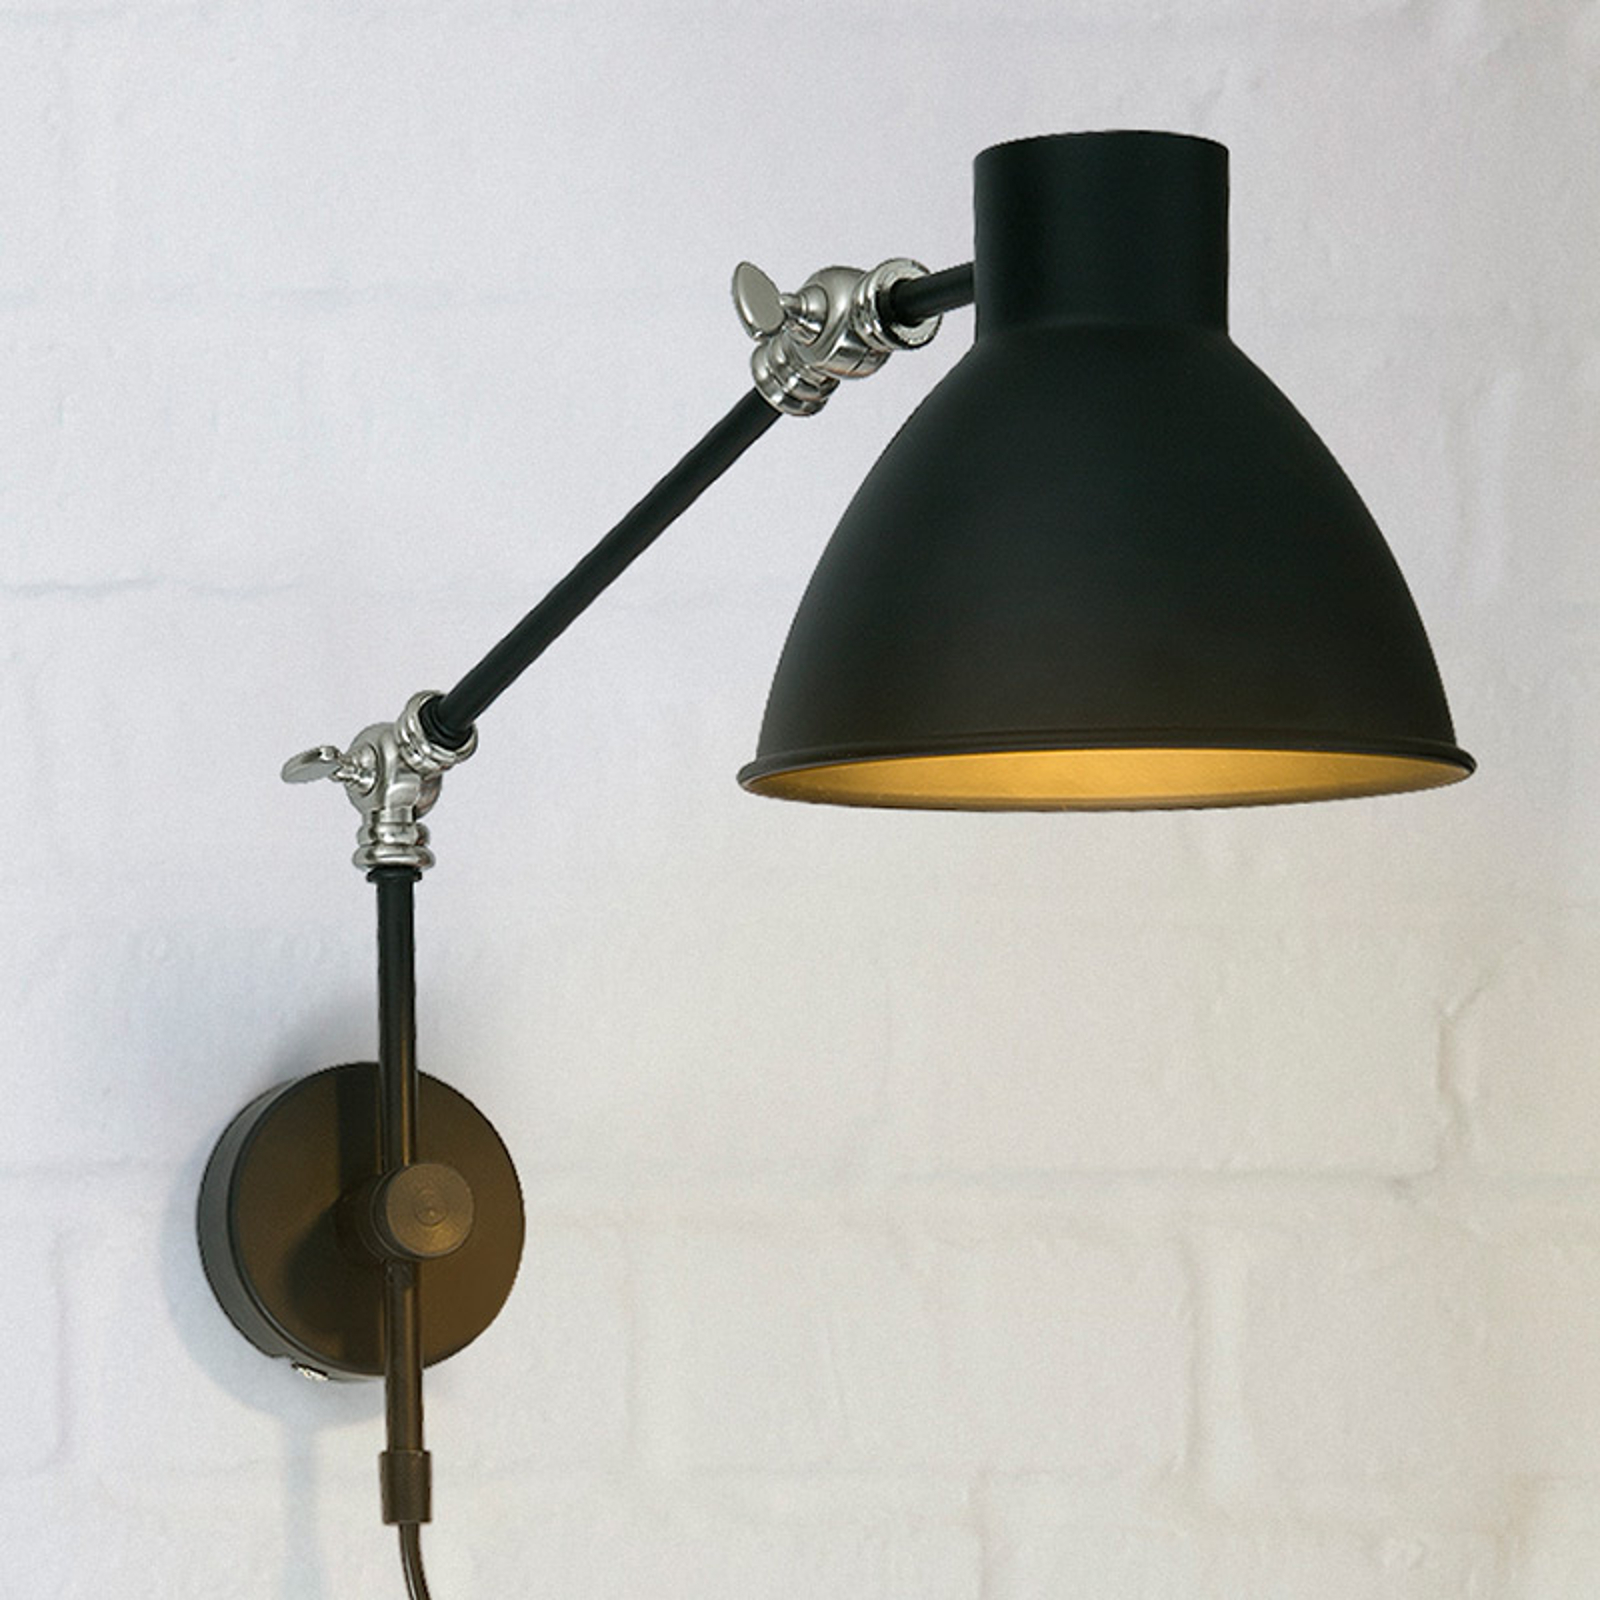 Vägglampa Celia, justerbar, svart